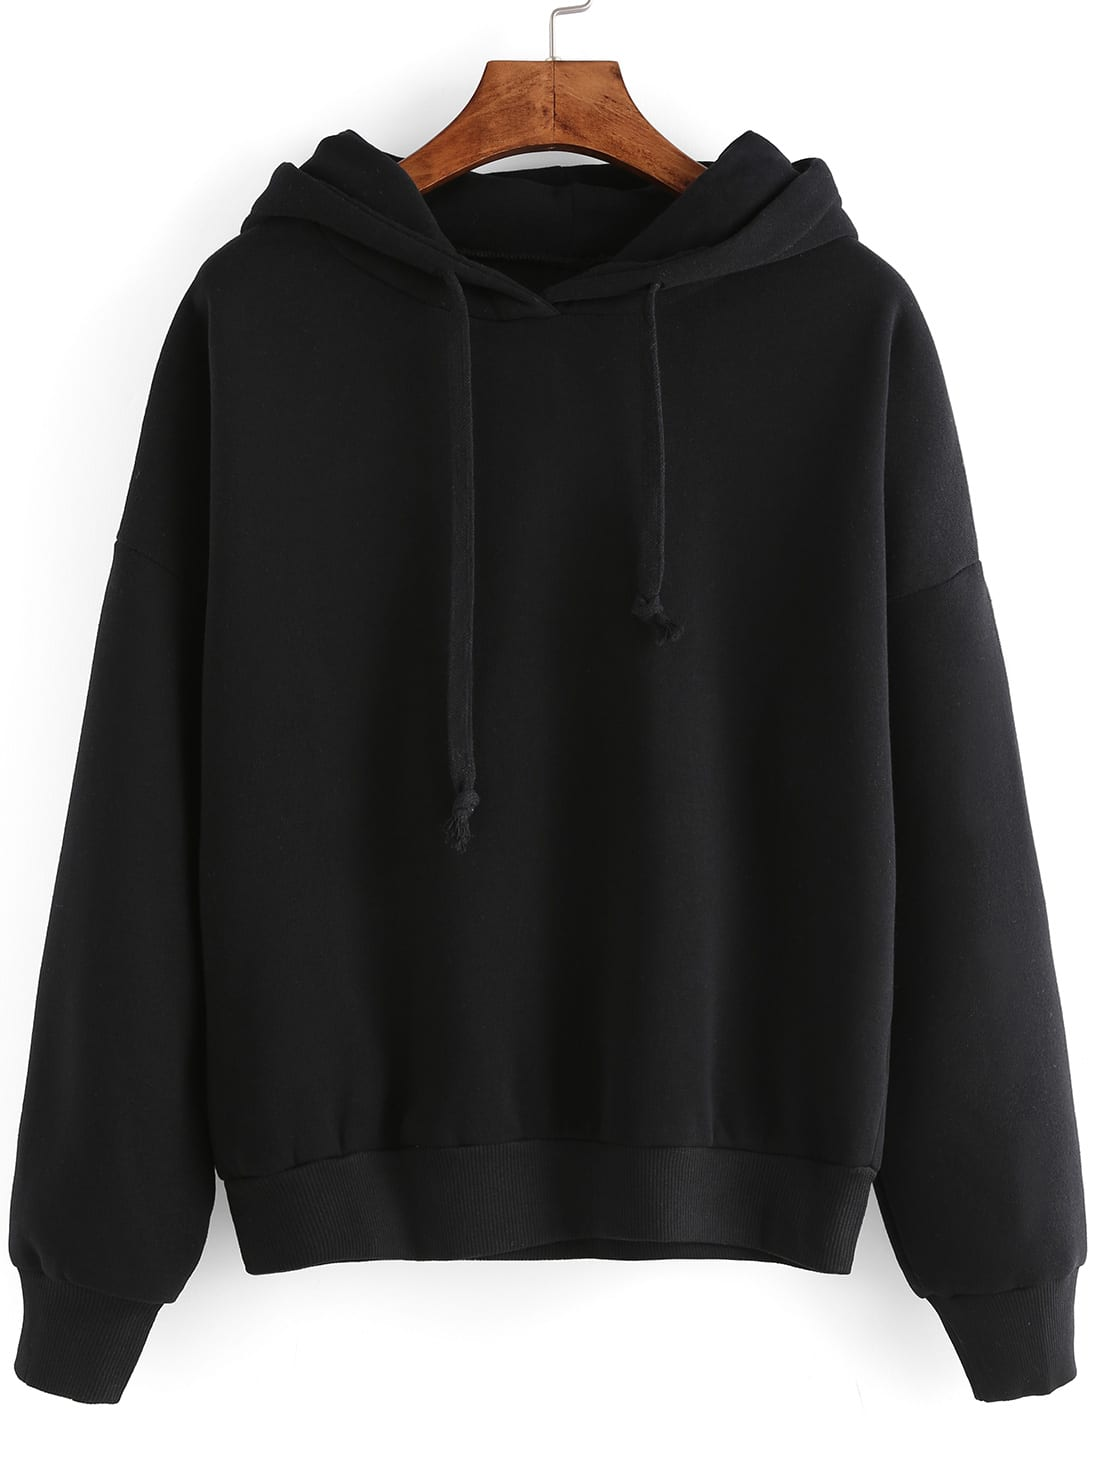 Black Hooded Long Sleeve Crop Sweatshirt интегральная микросхема nxp 100